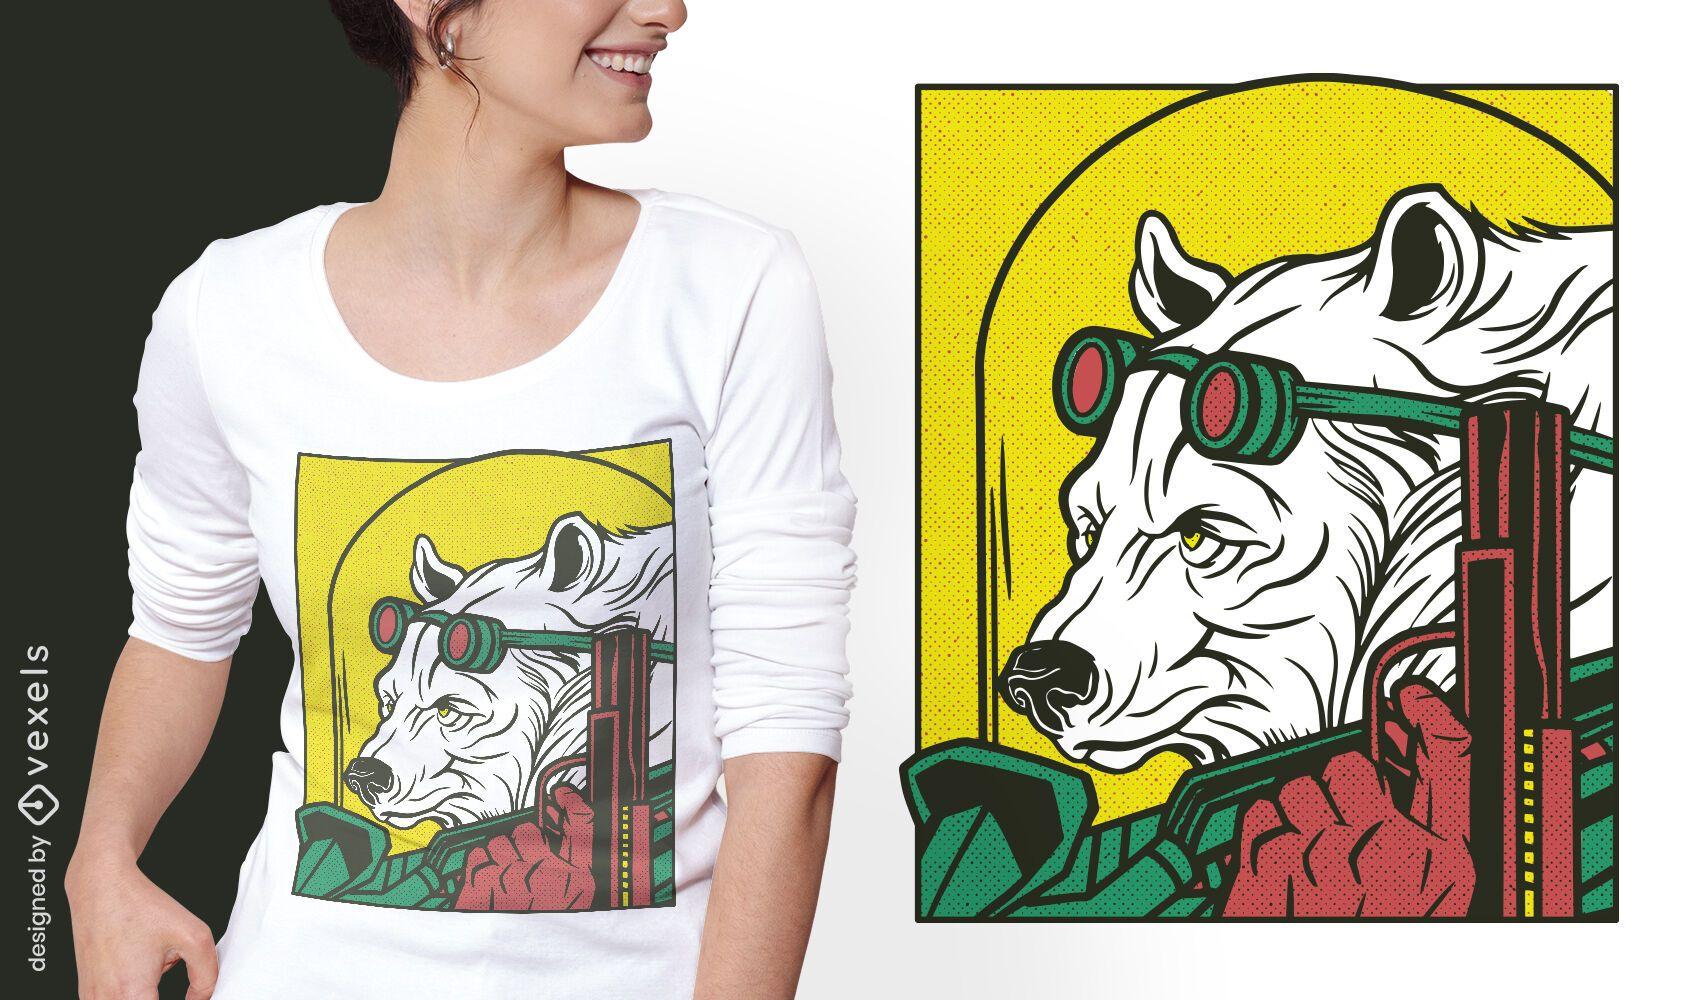 Diseño de camiseta cómica animal oso mafia